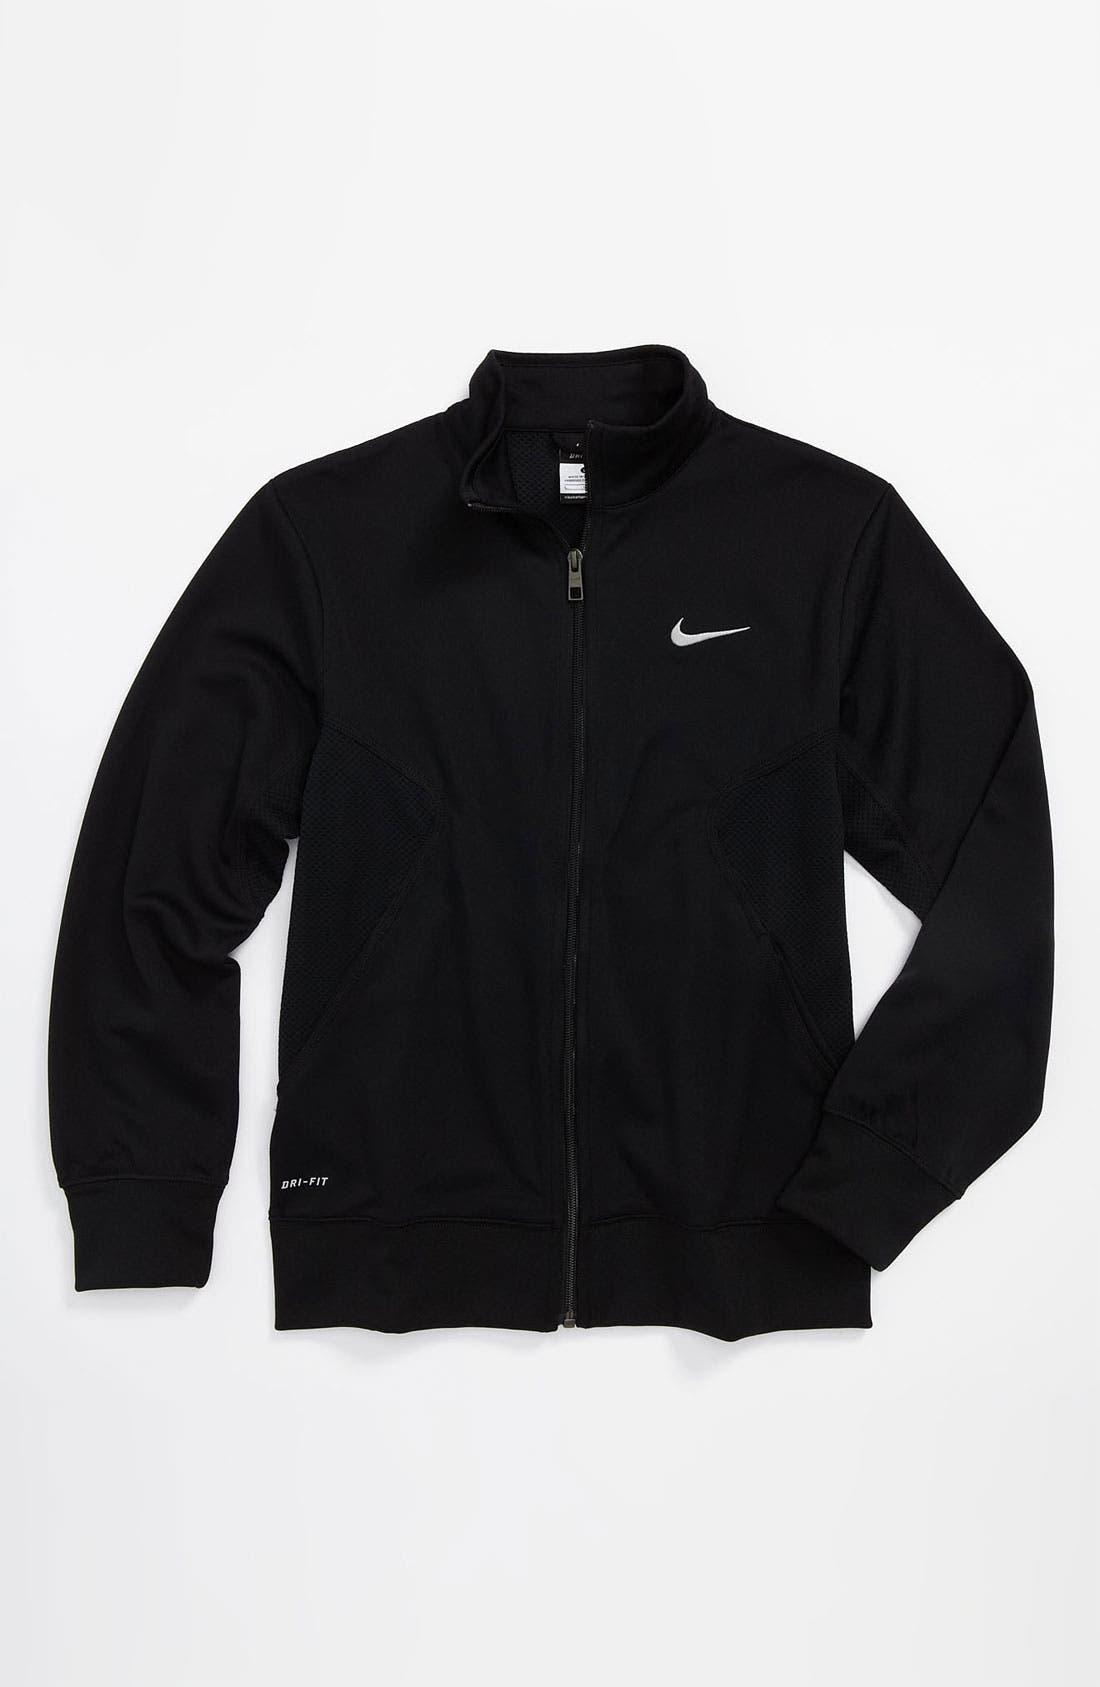 Alternate Image 1 Selected - Nike Dri-FIT Jacket (Big Boys)